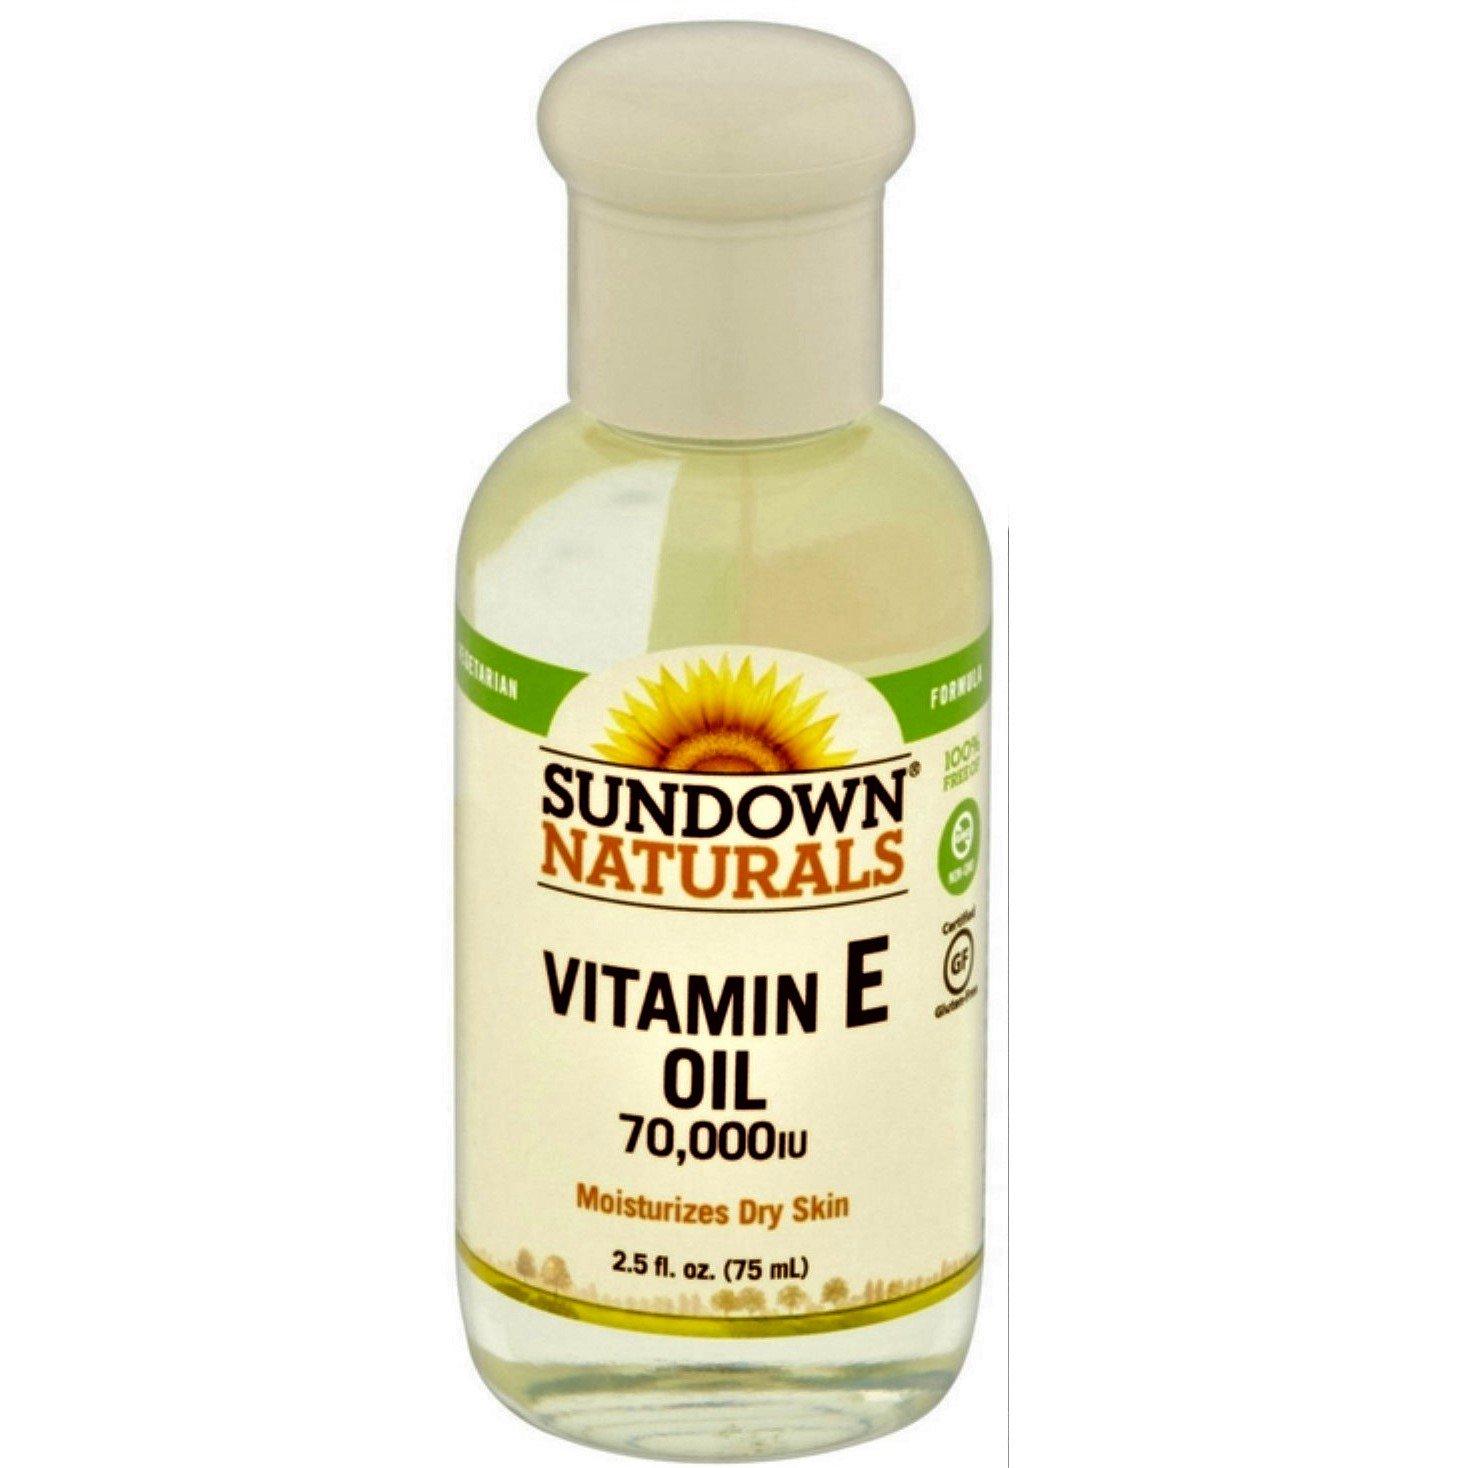 Sundown Naturals Pure Vitamin E-Oil 70000 IU, 2.5 Oz